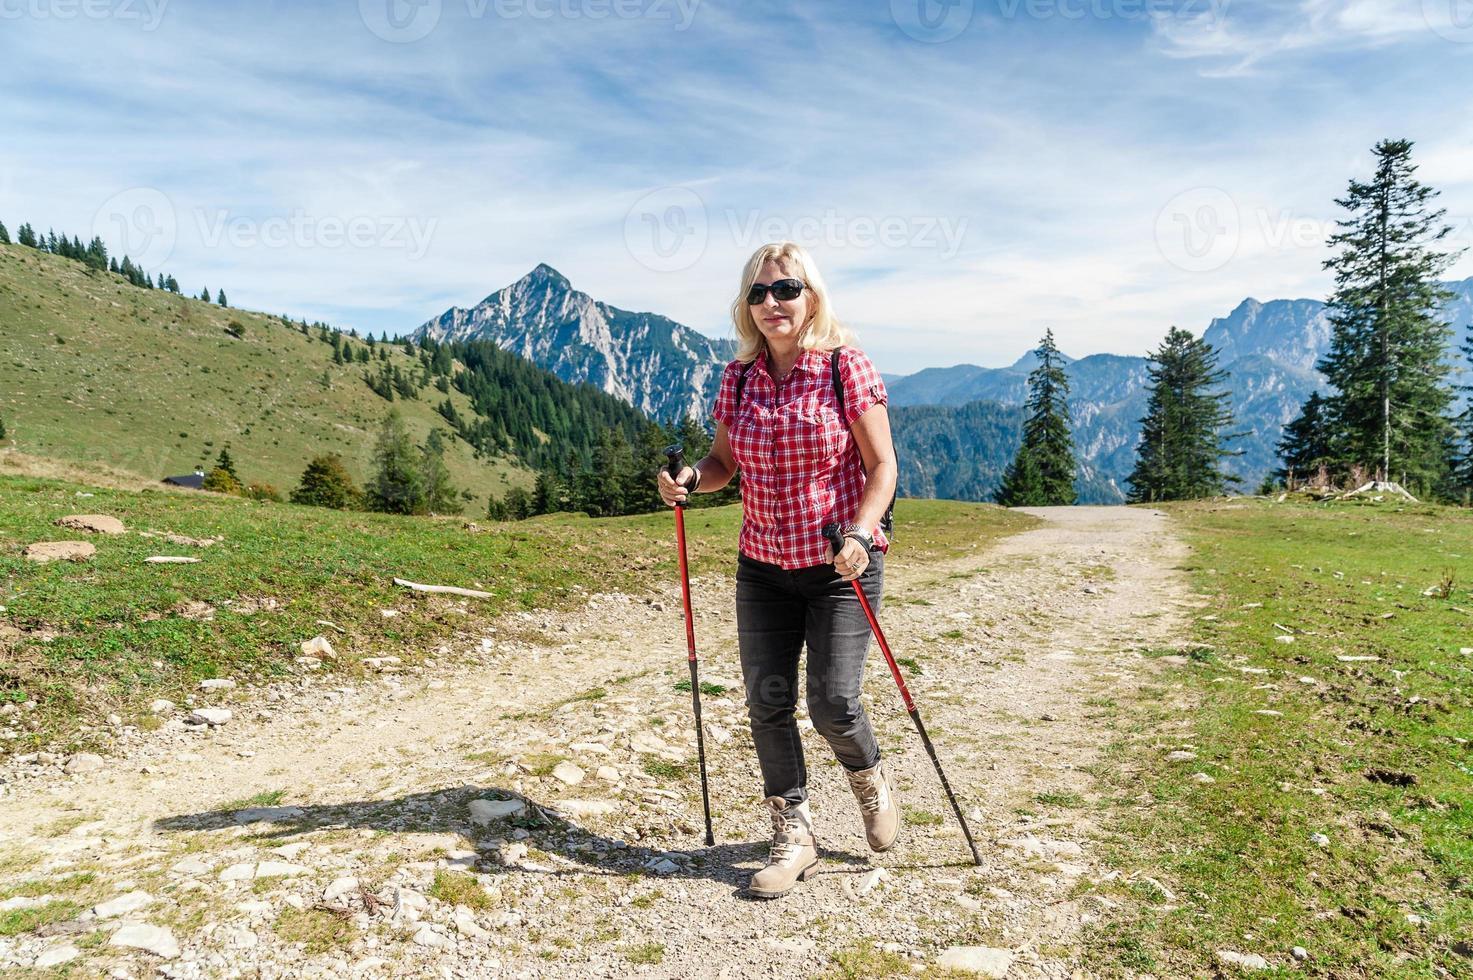 escursionista femmina foto